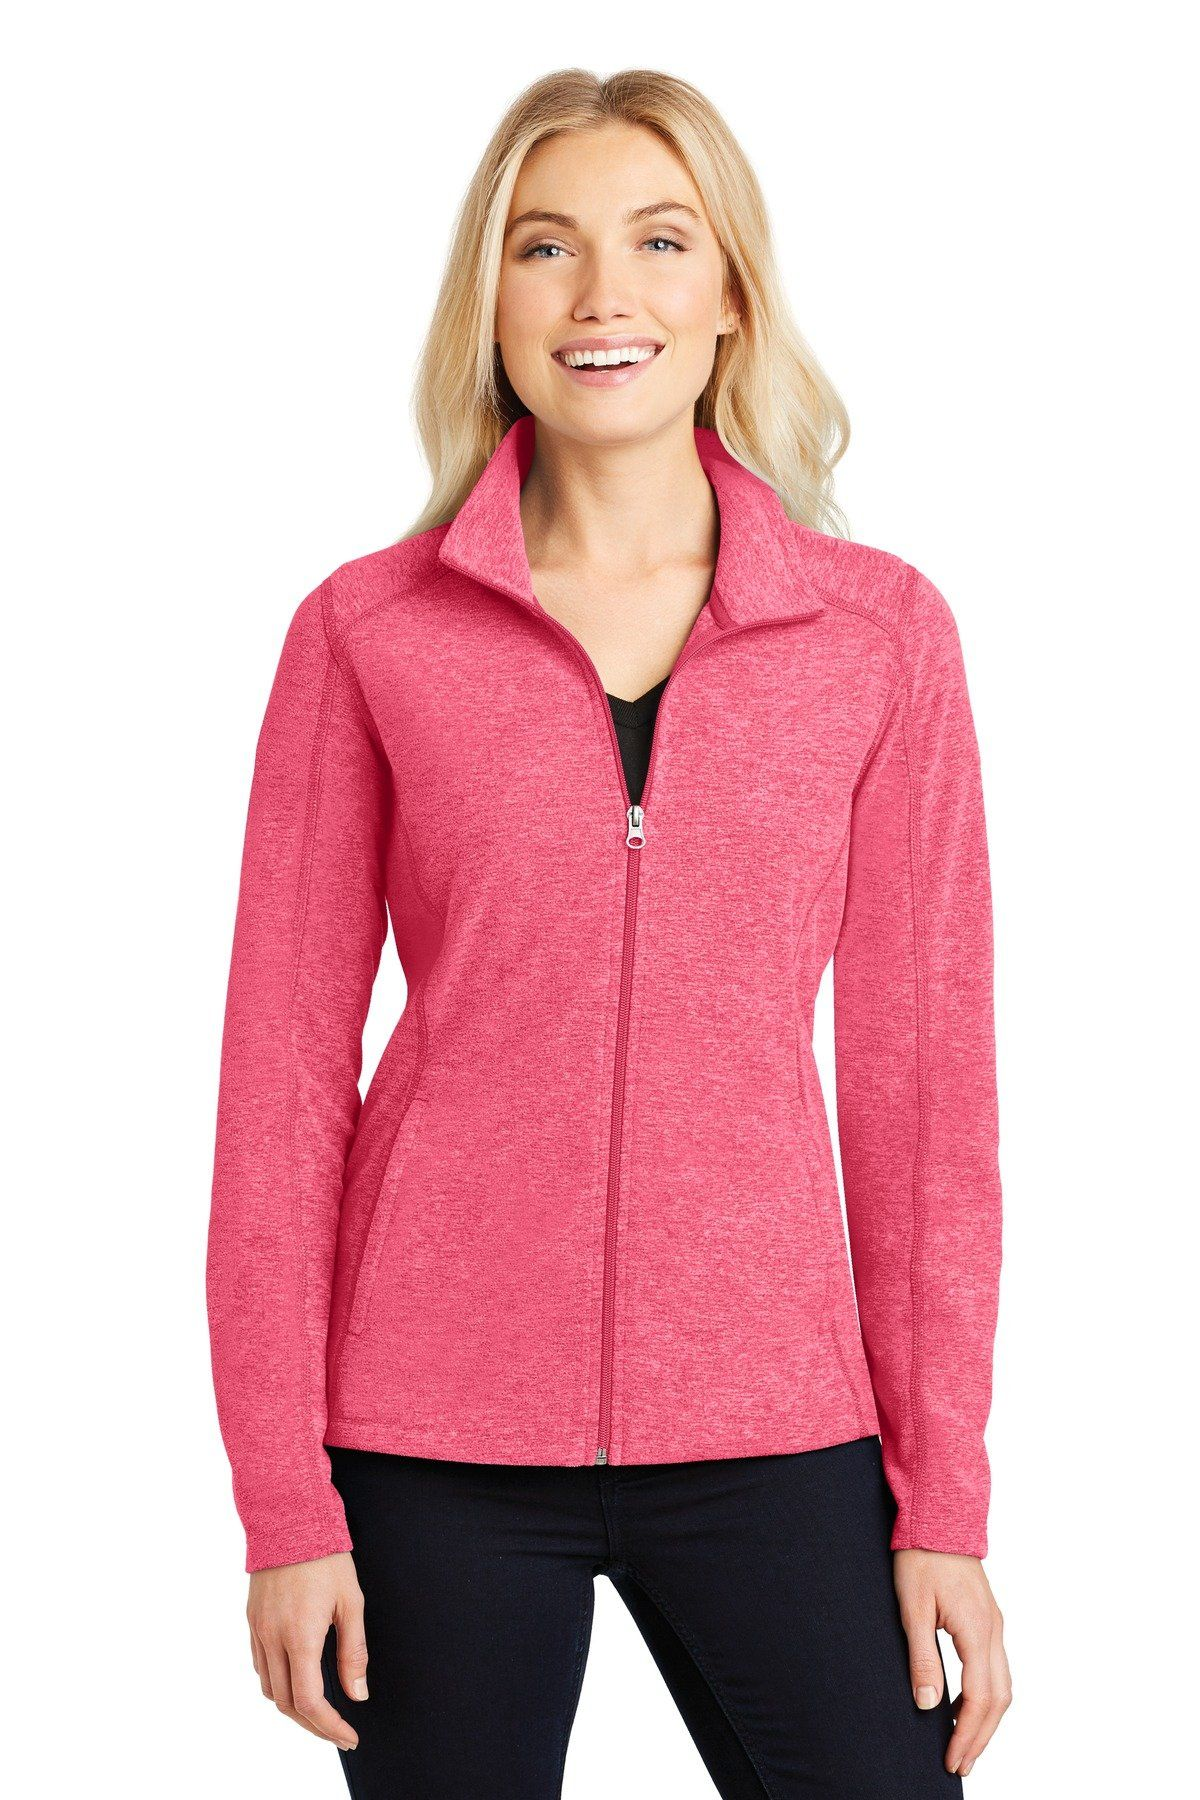 d6662d84c8a5 Port Authority® Ladies Heather Microfleece Full-Zip Jacket. L235 ...